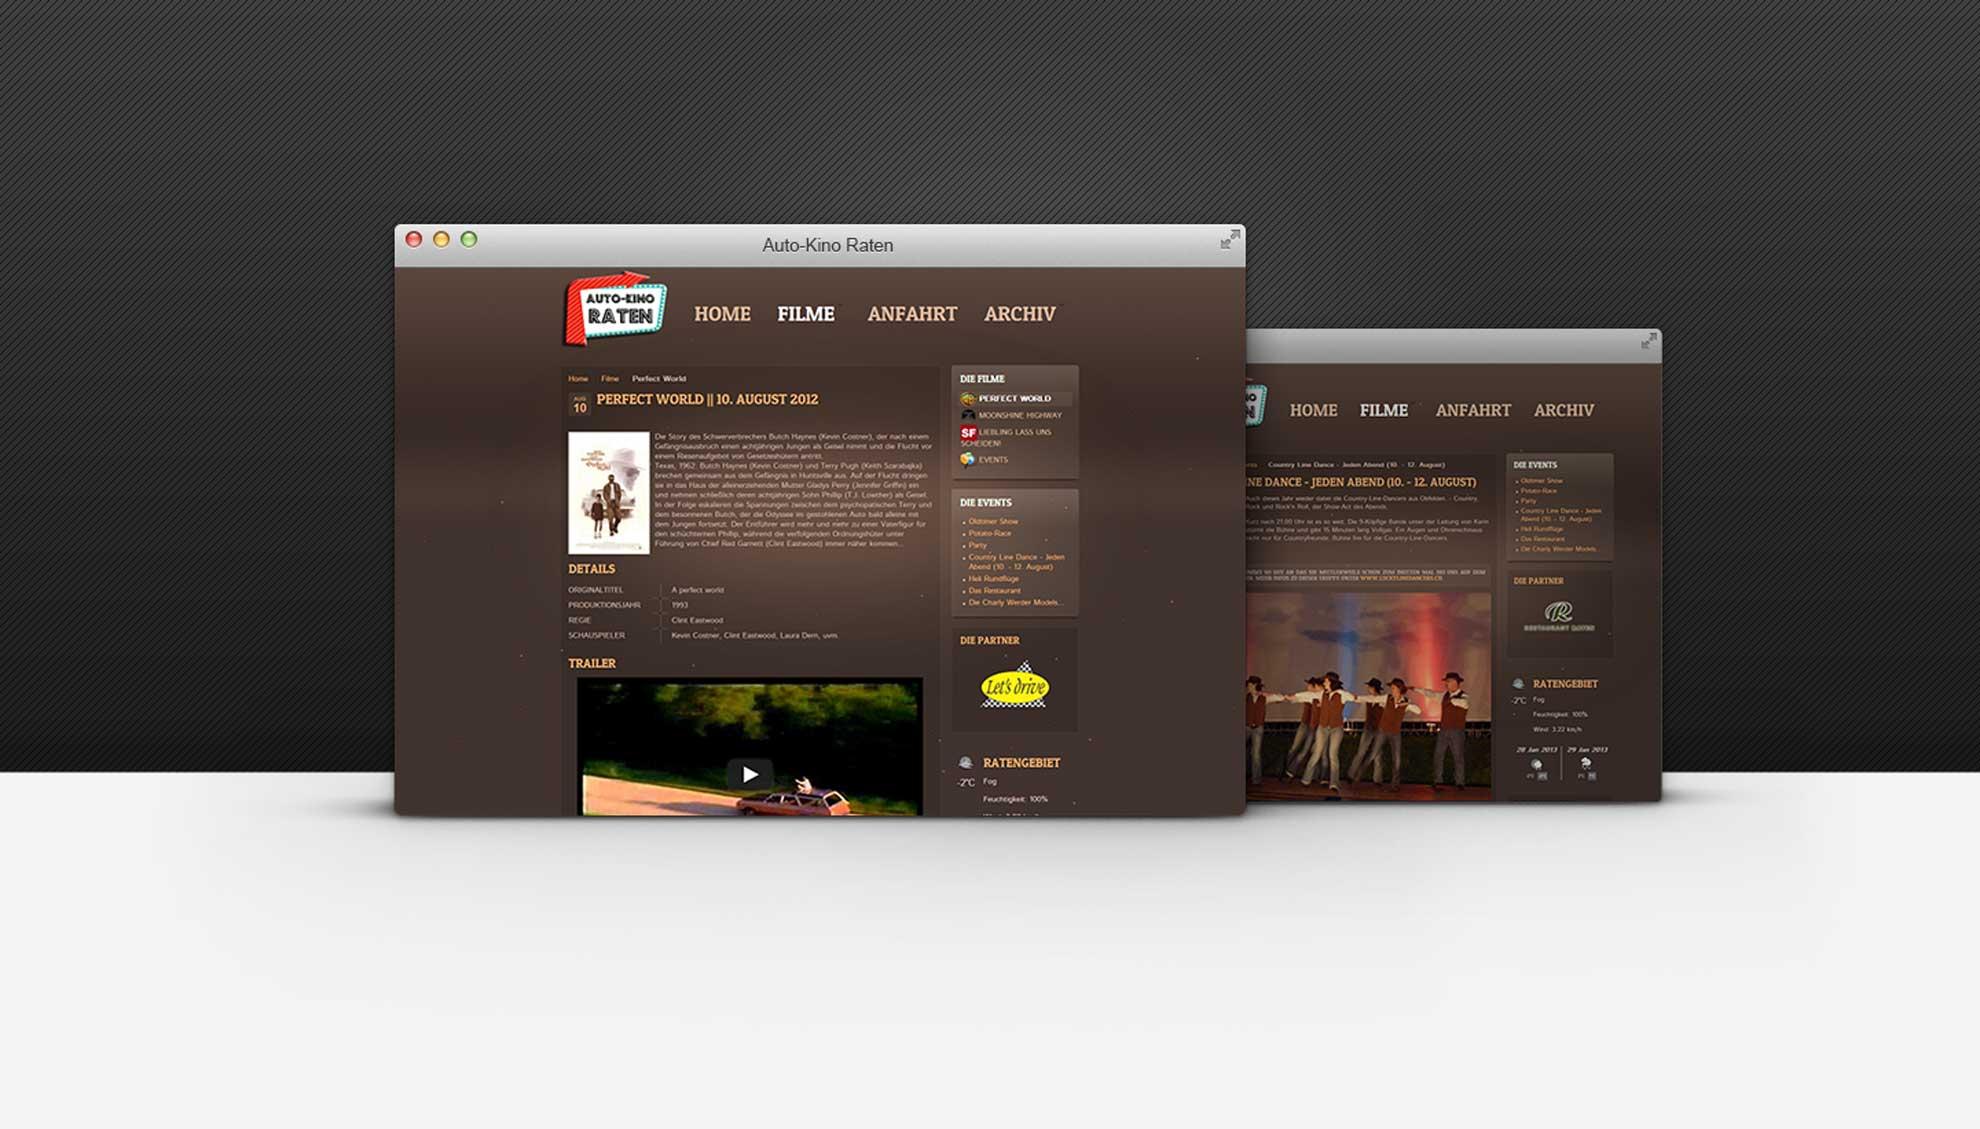 auto kino raten web360 full service design agentur. Black Bedroom Furniture Sets. Home Design Ideas